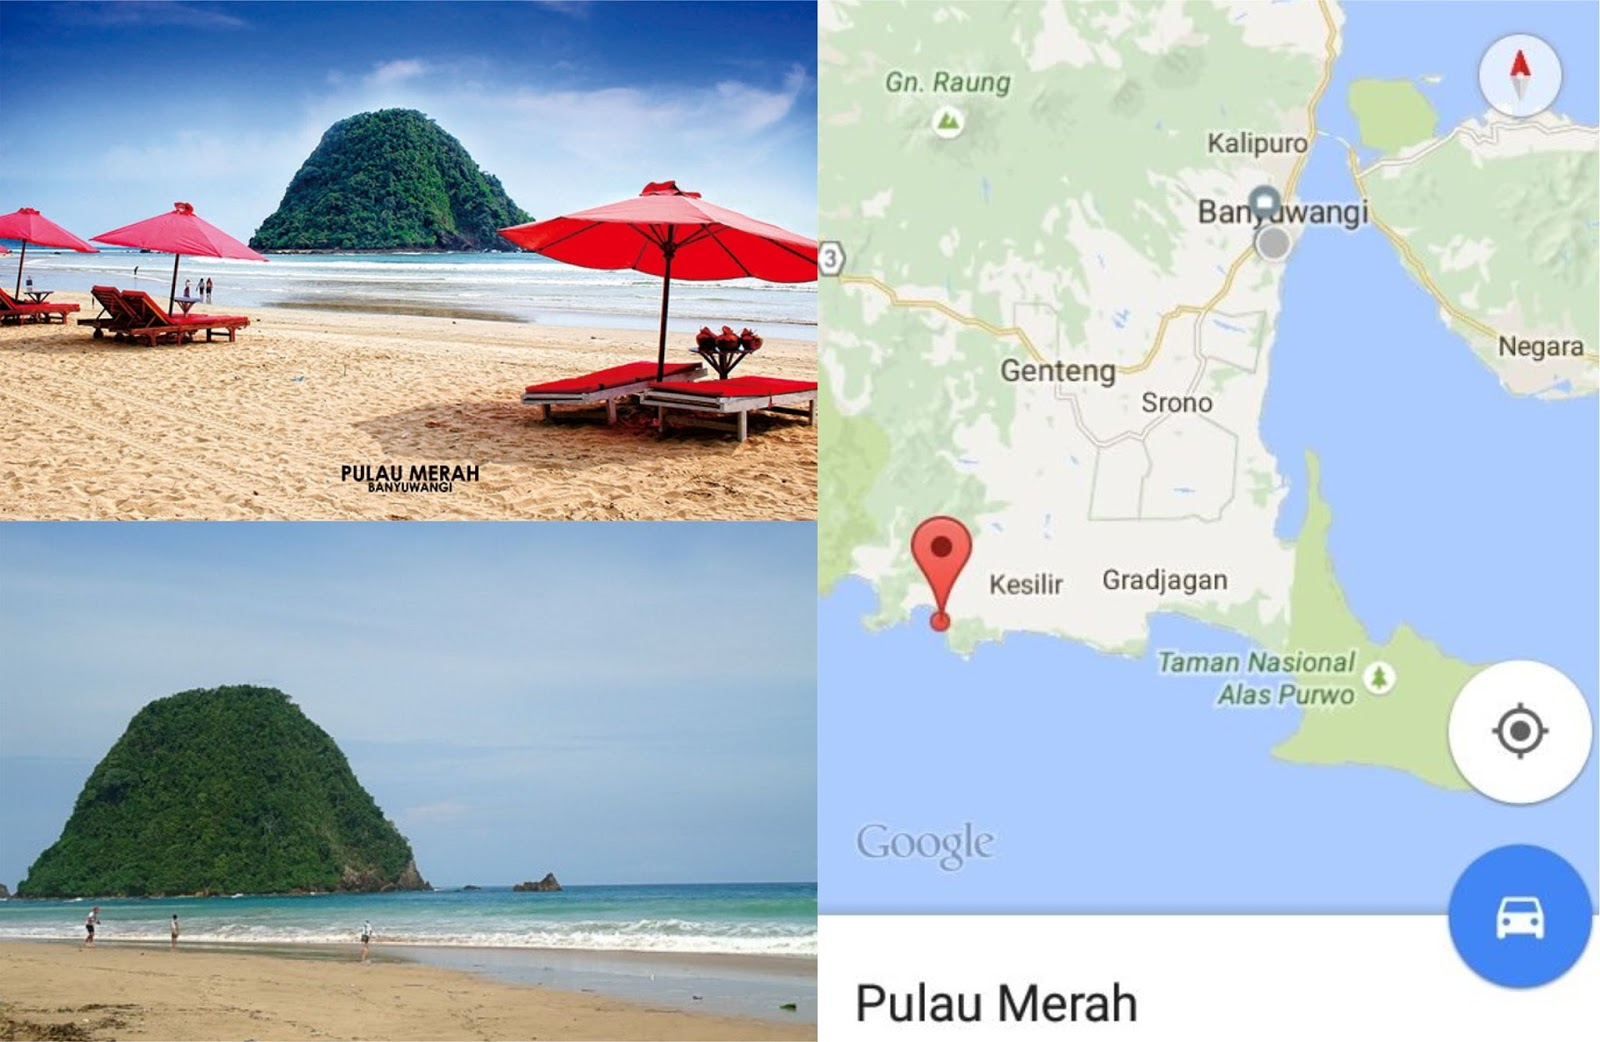 Coretan Kita Bersama Nama Pantai Kabupaten Banyuwangi Pulau Merah Red